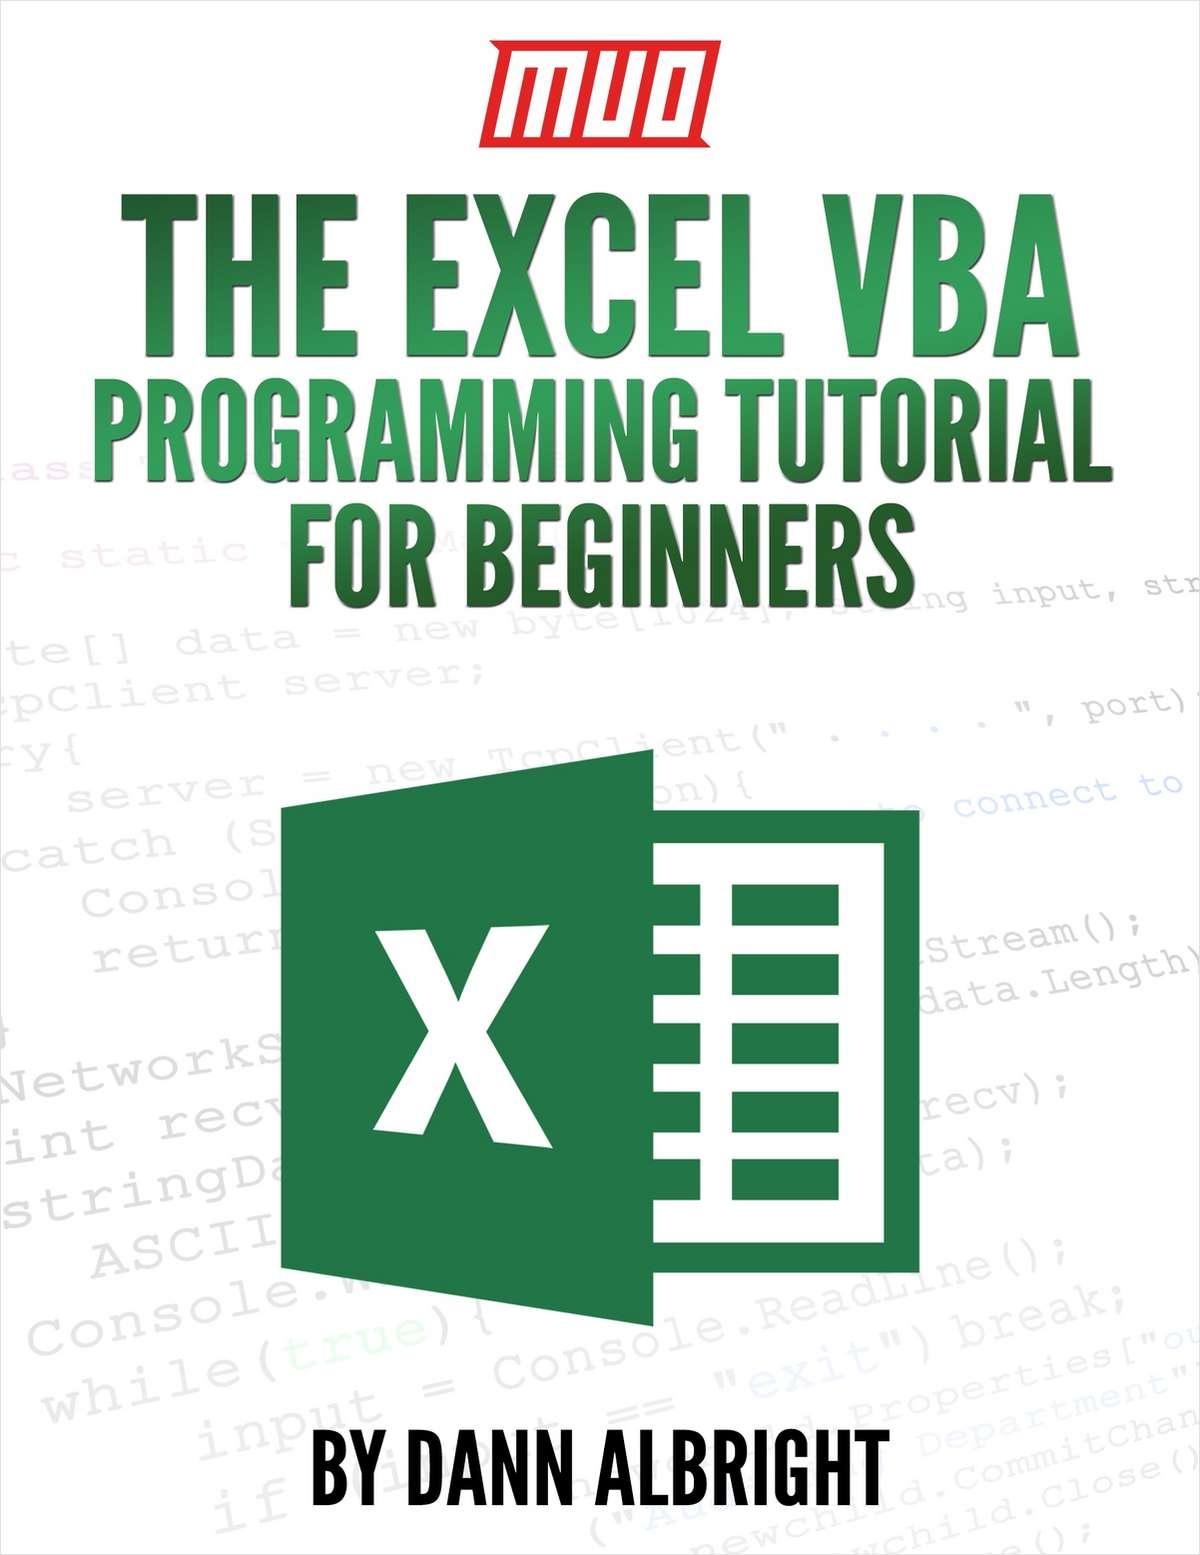 Free The Excel VBA Programming Tutorial for Beginners (100